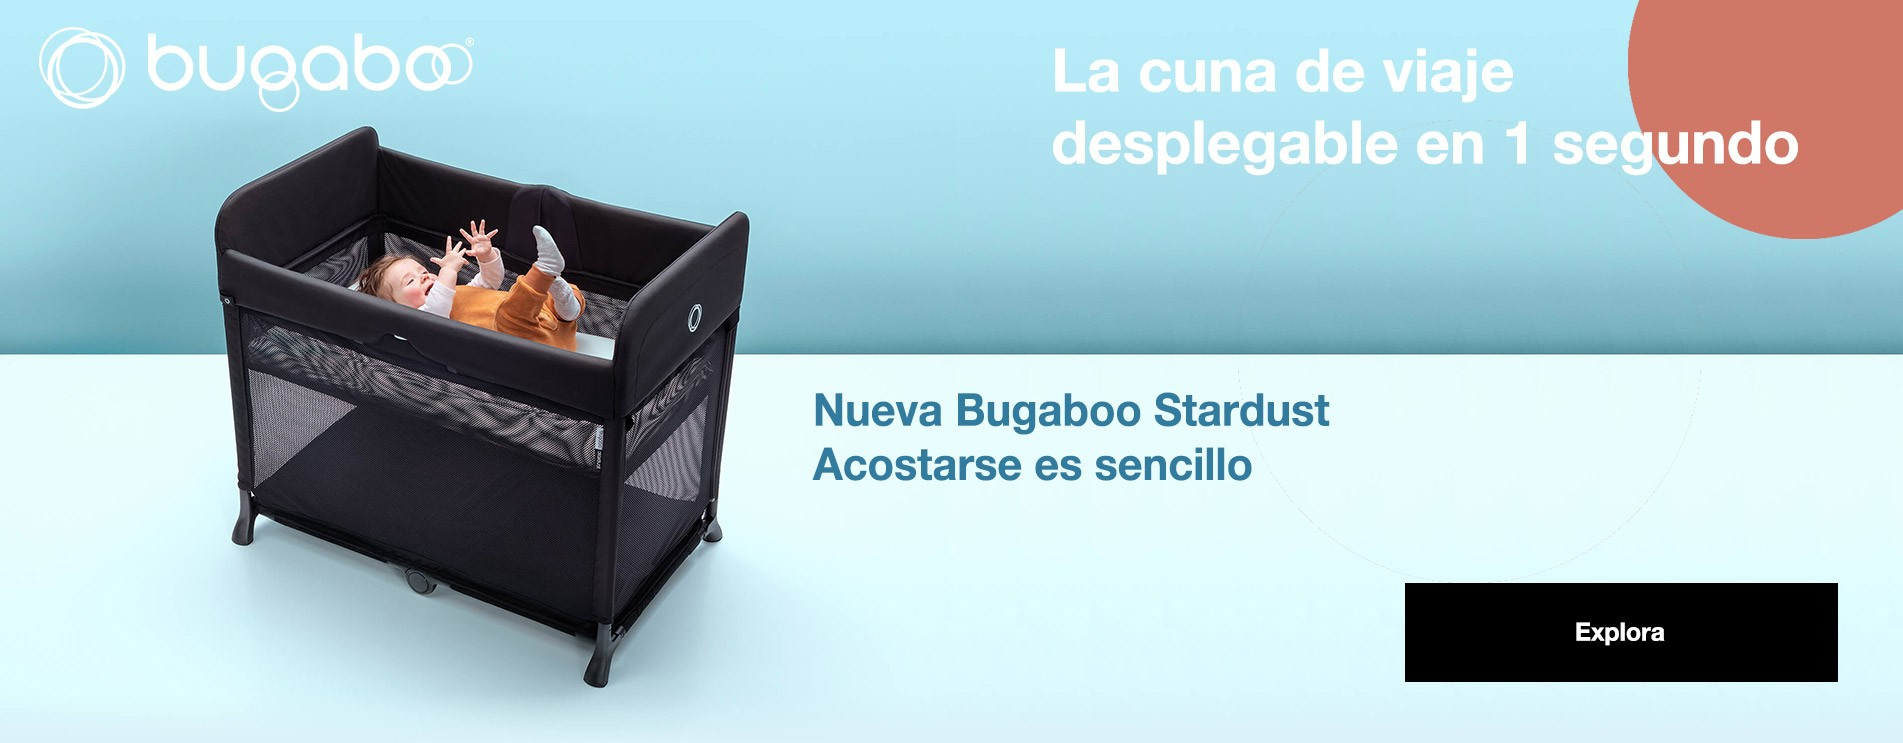 Nueva Bugaboo Stardust